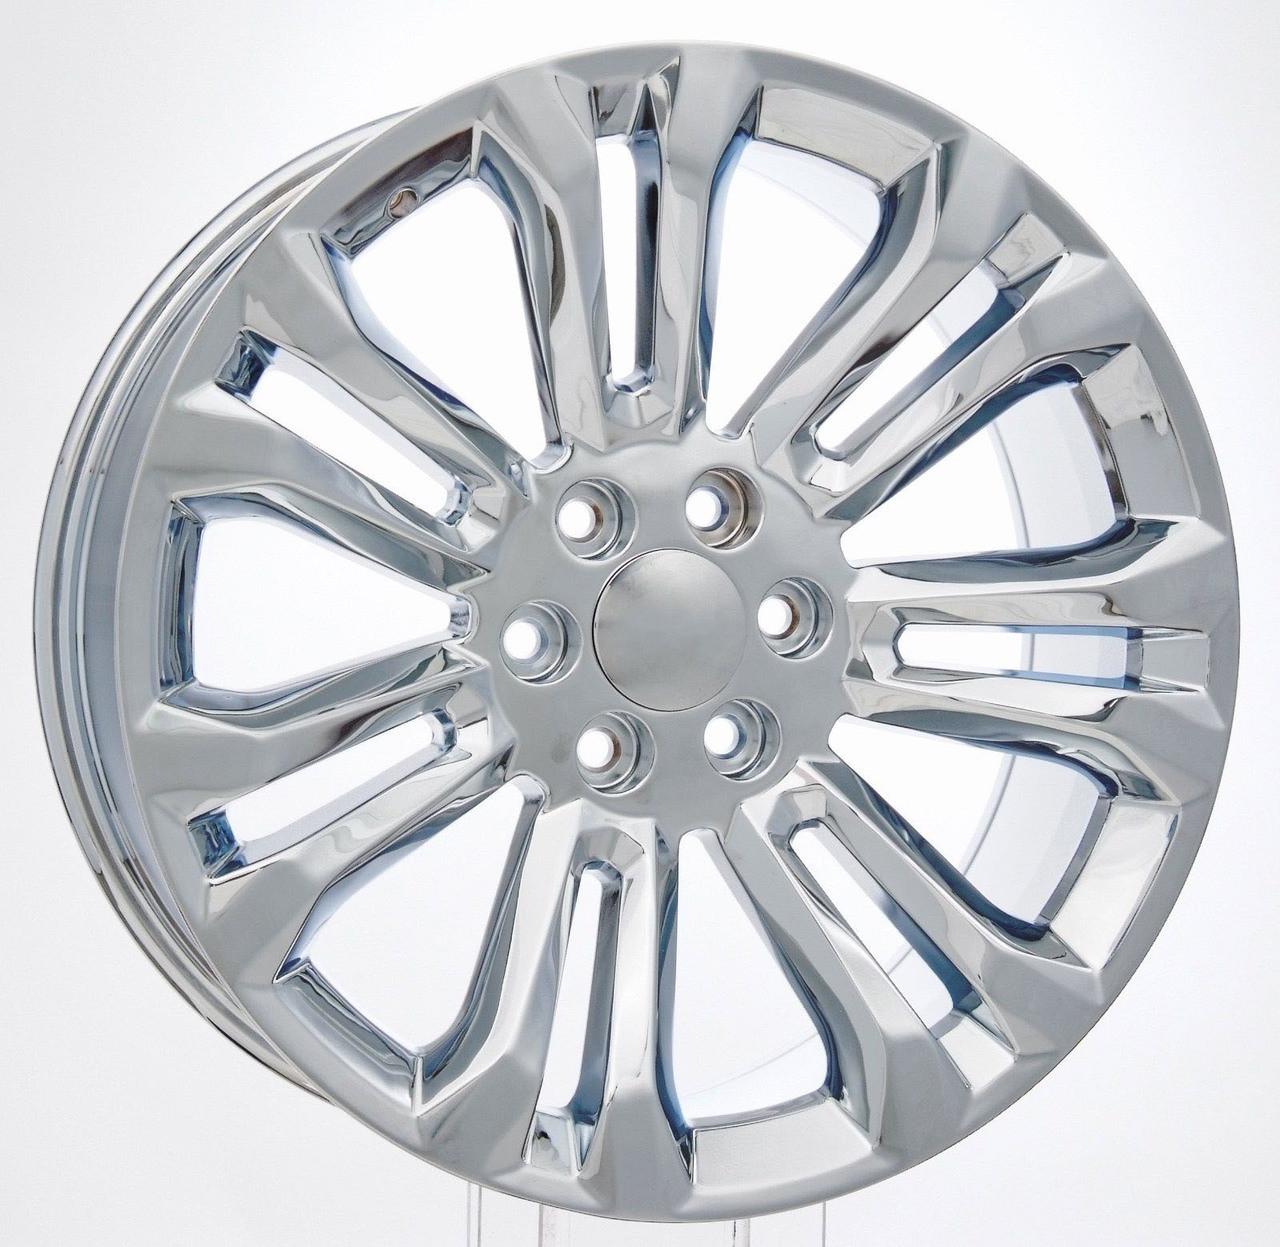 "Chrome 22"" New Style Split Spoke Wheels for GMC Sierra, Yukon, Denali - New Set of 4"